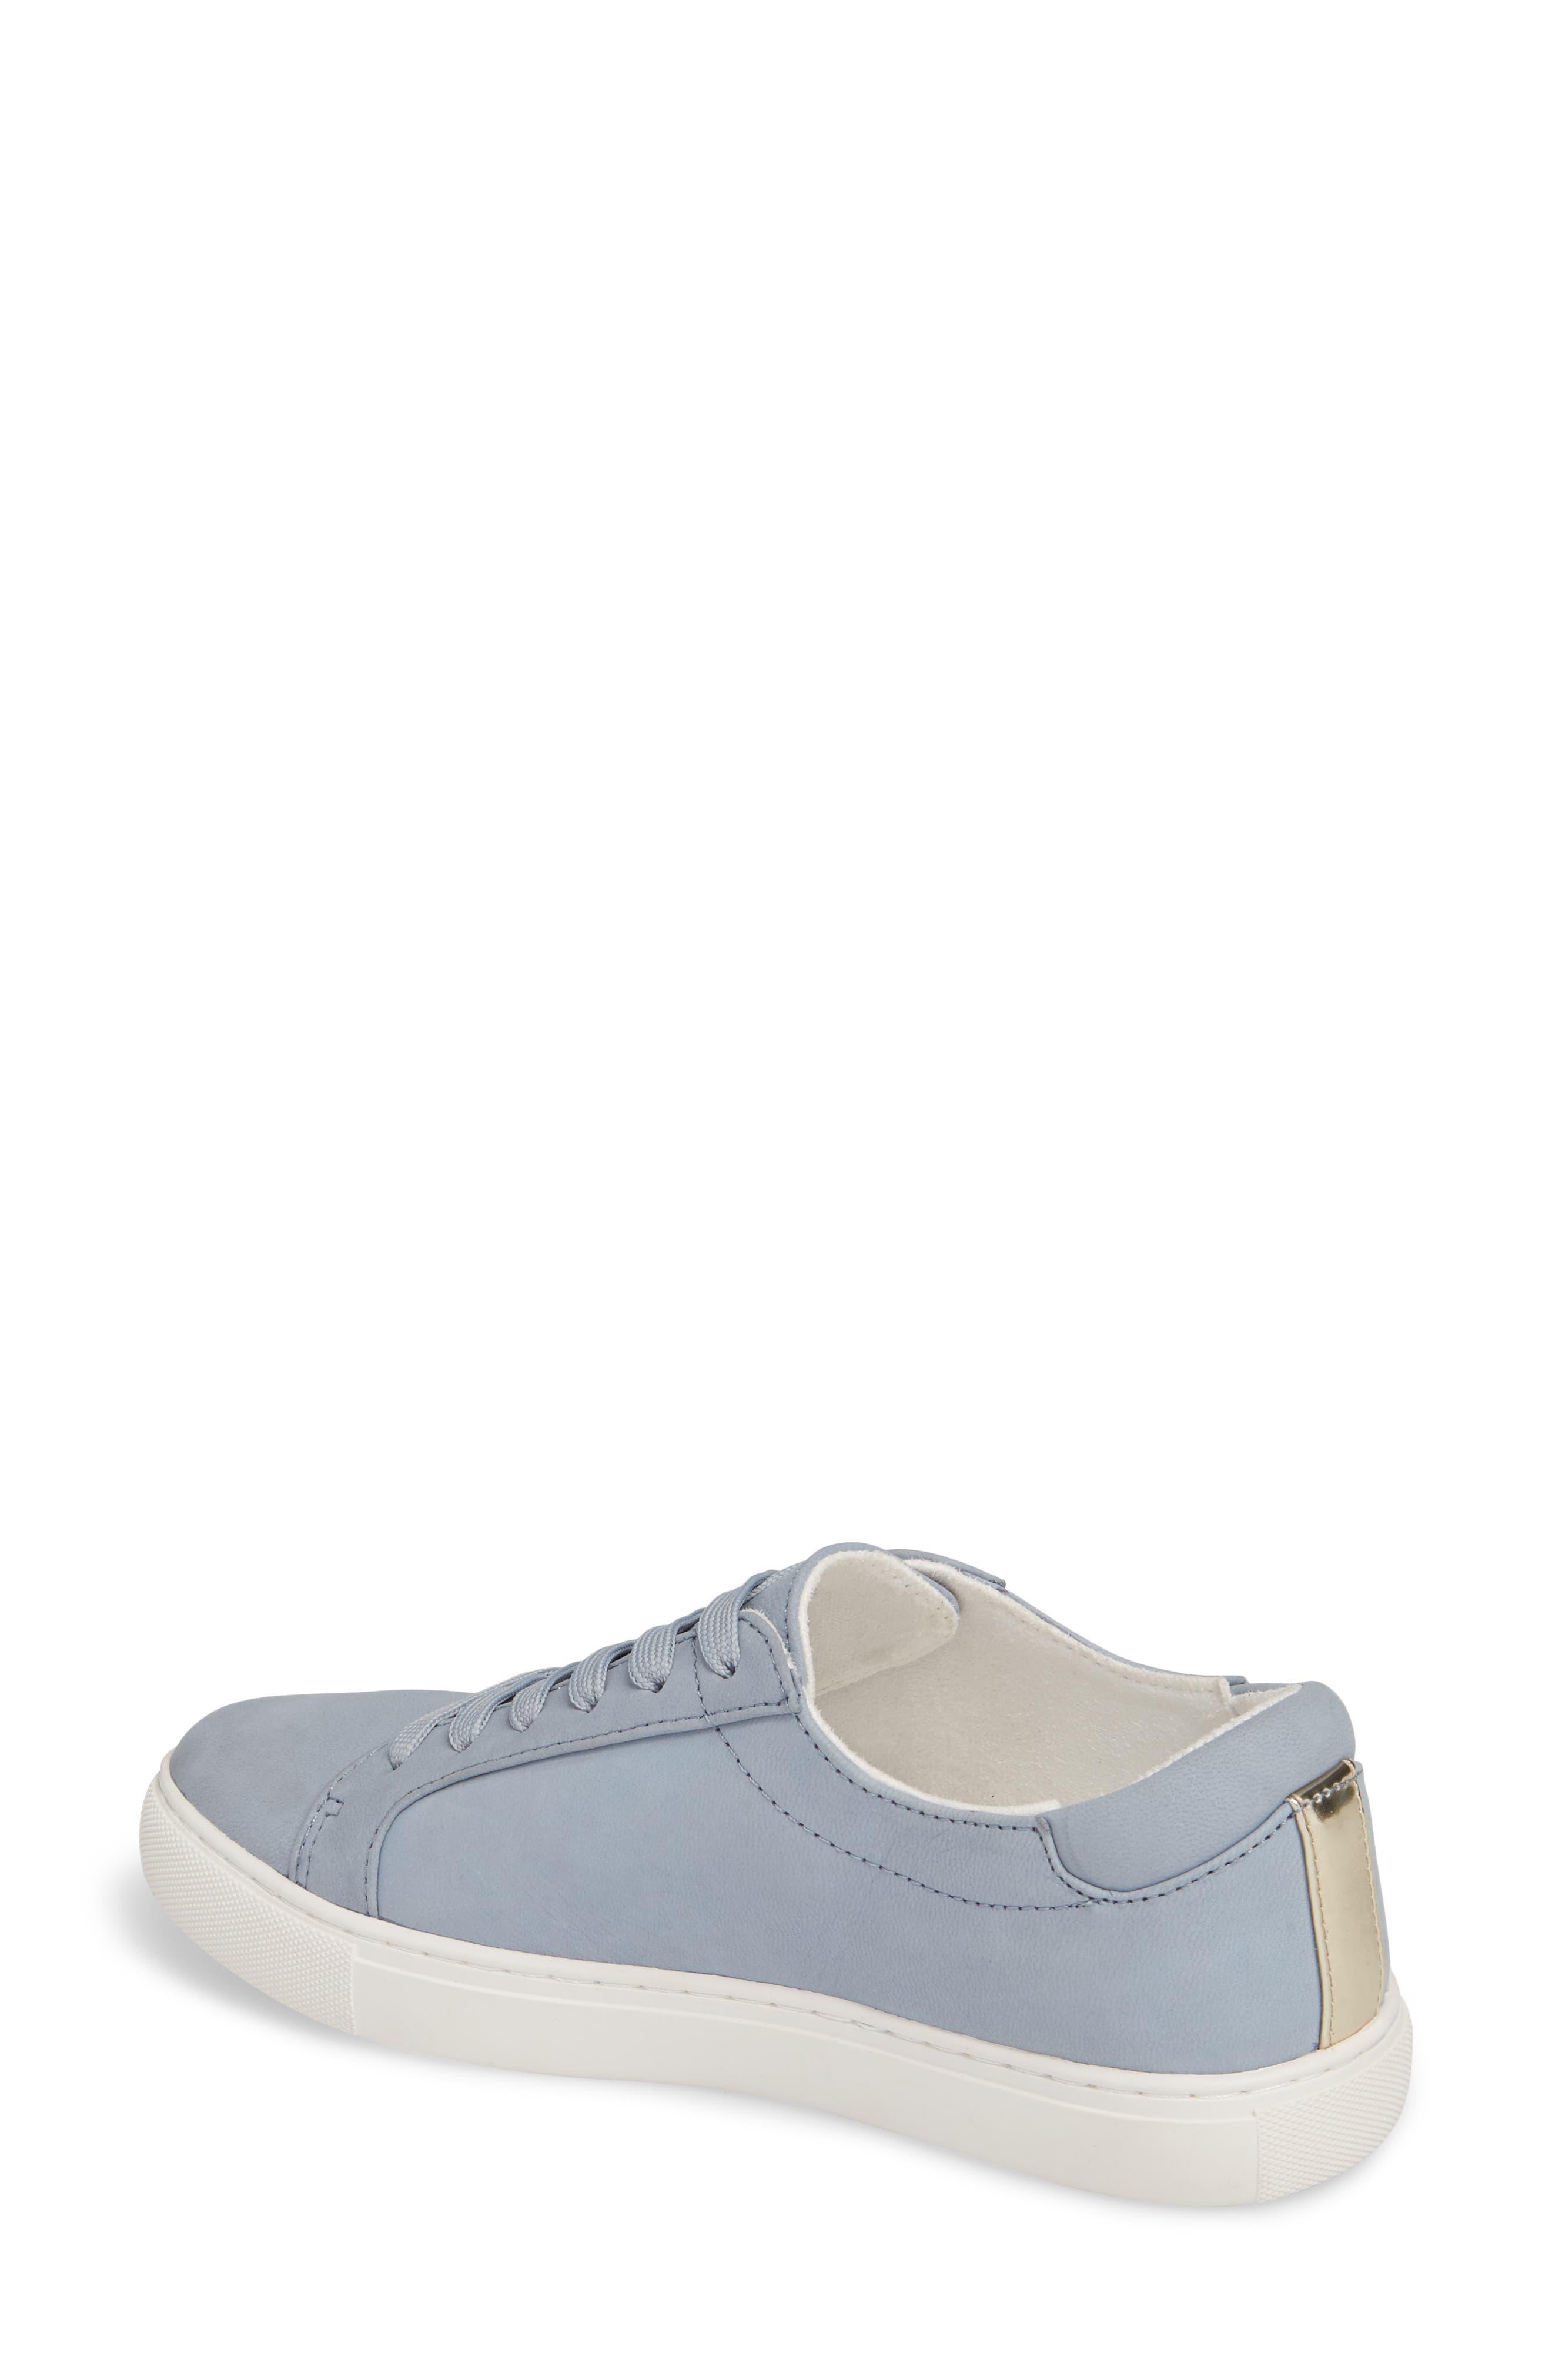 Kam Techni-Cole Sneaker,                             Alternate thumbnail 2, color,                             025